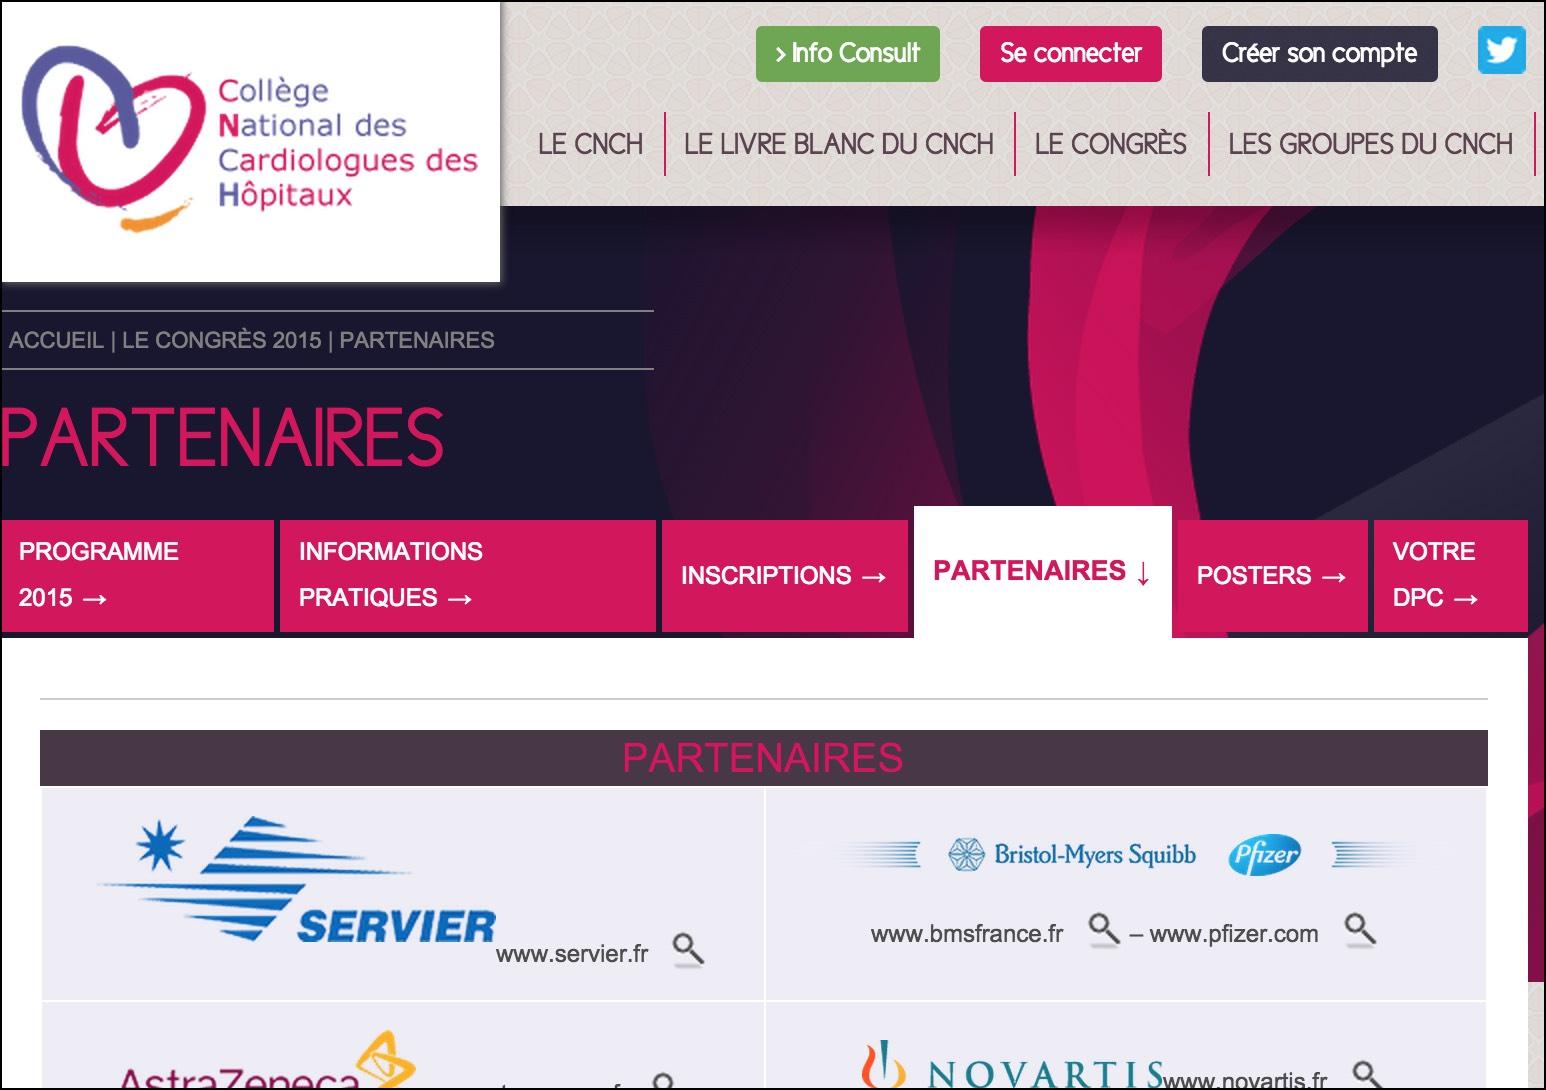 SERVIER2015-CNCH-partenaires